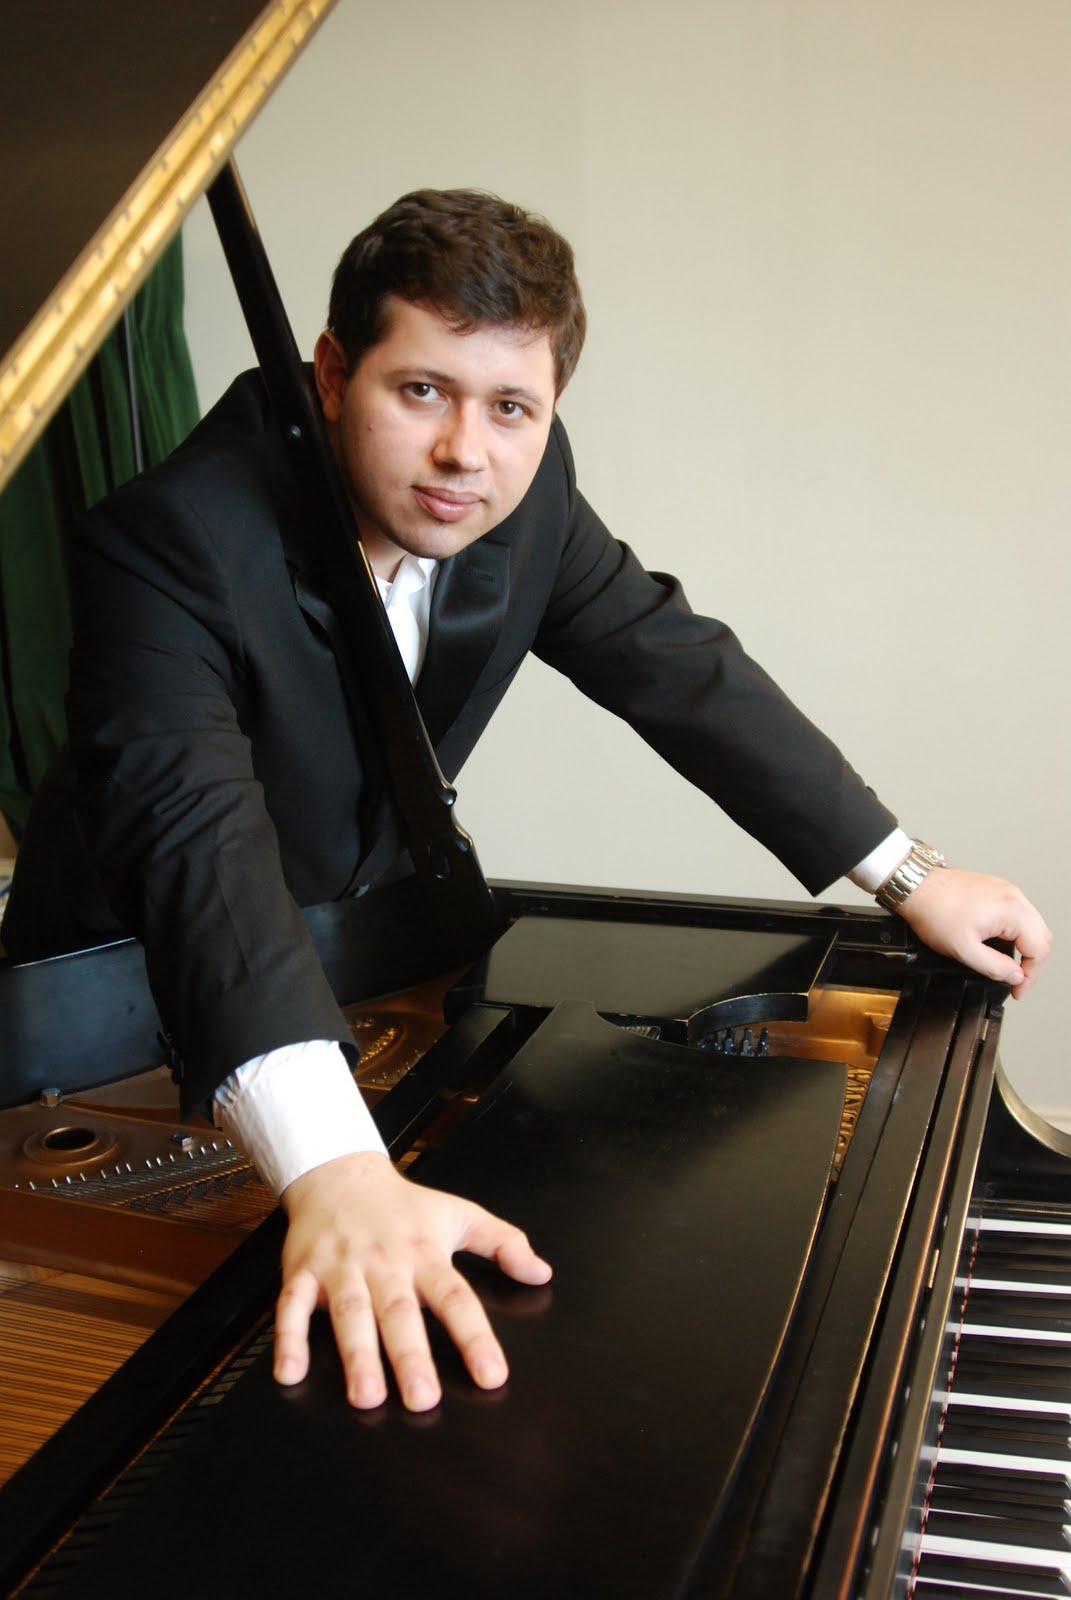 washington college news prize winning violinist and pianist next  washington college news